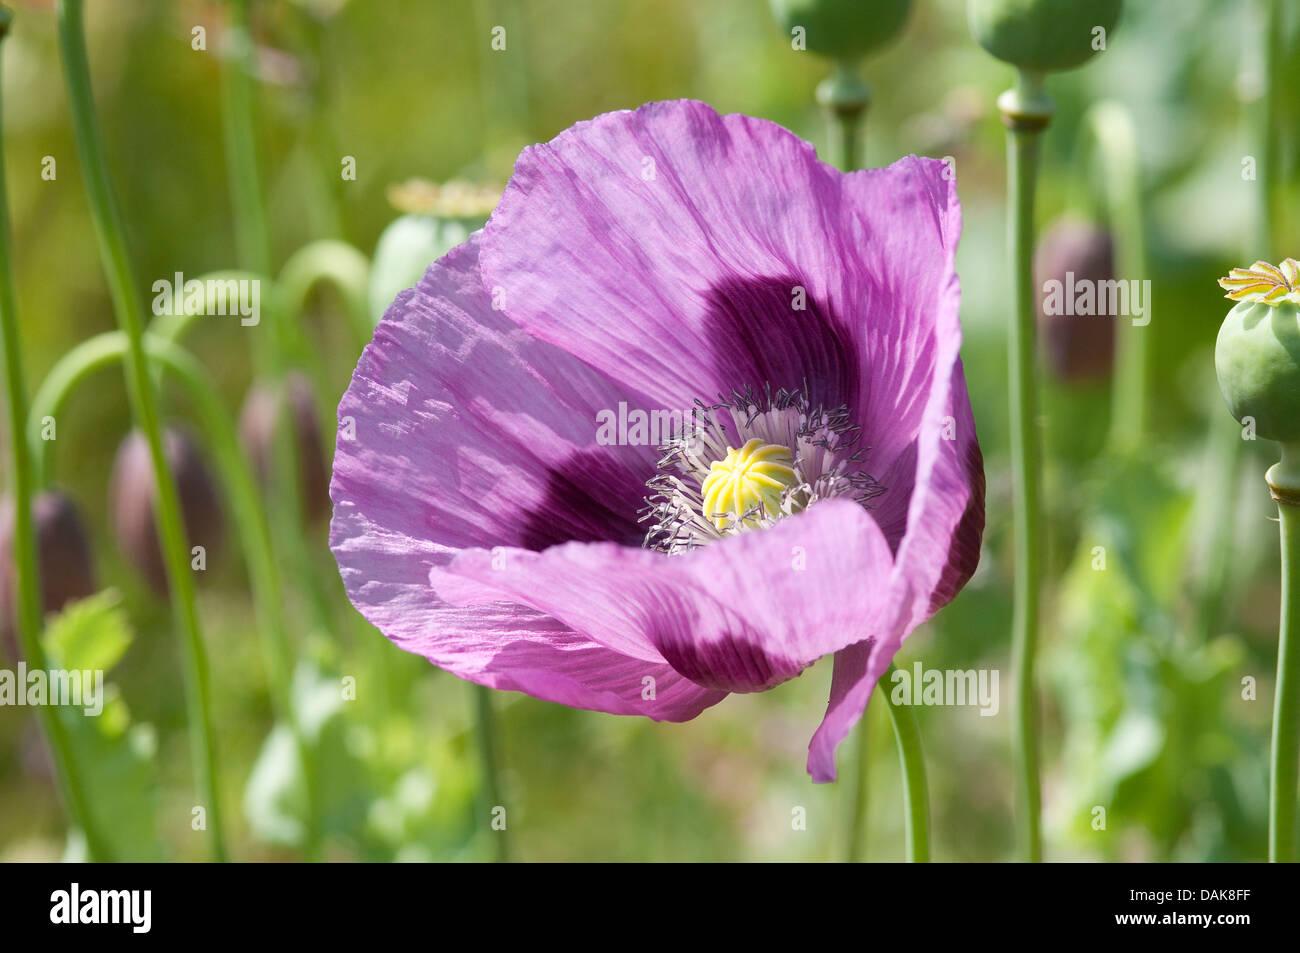 Purple poppy flower stock photos purple poppy flower stock images purple poppy flower in wildflower meadow stock image mightylinksfo